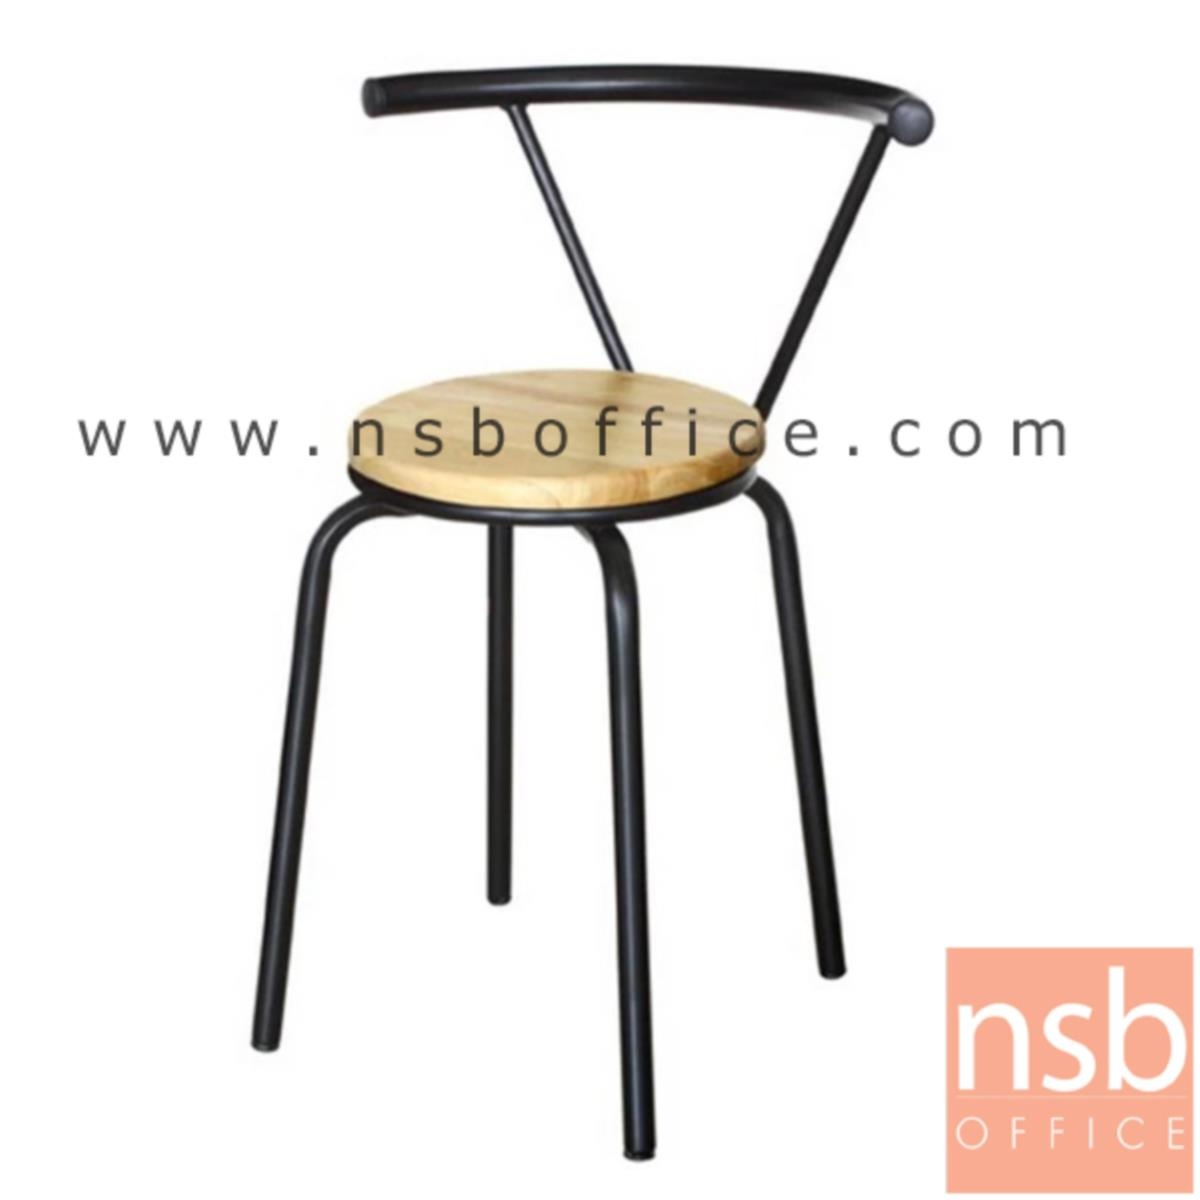 B20A085:เก้าอี้อเนกประสงค์ไม้ รุ่น Dimond  ขาเหล็กพ่นดำ